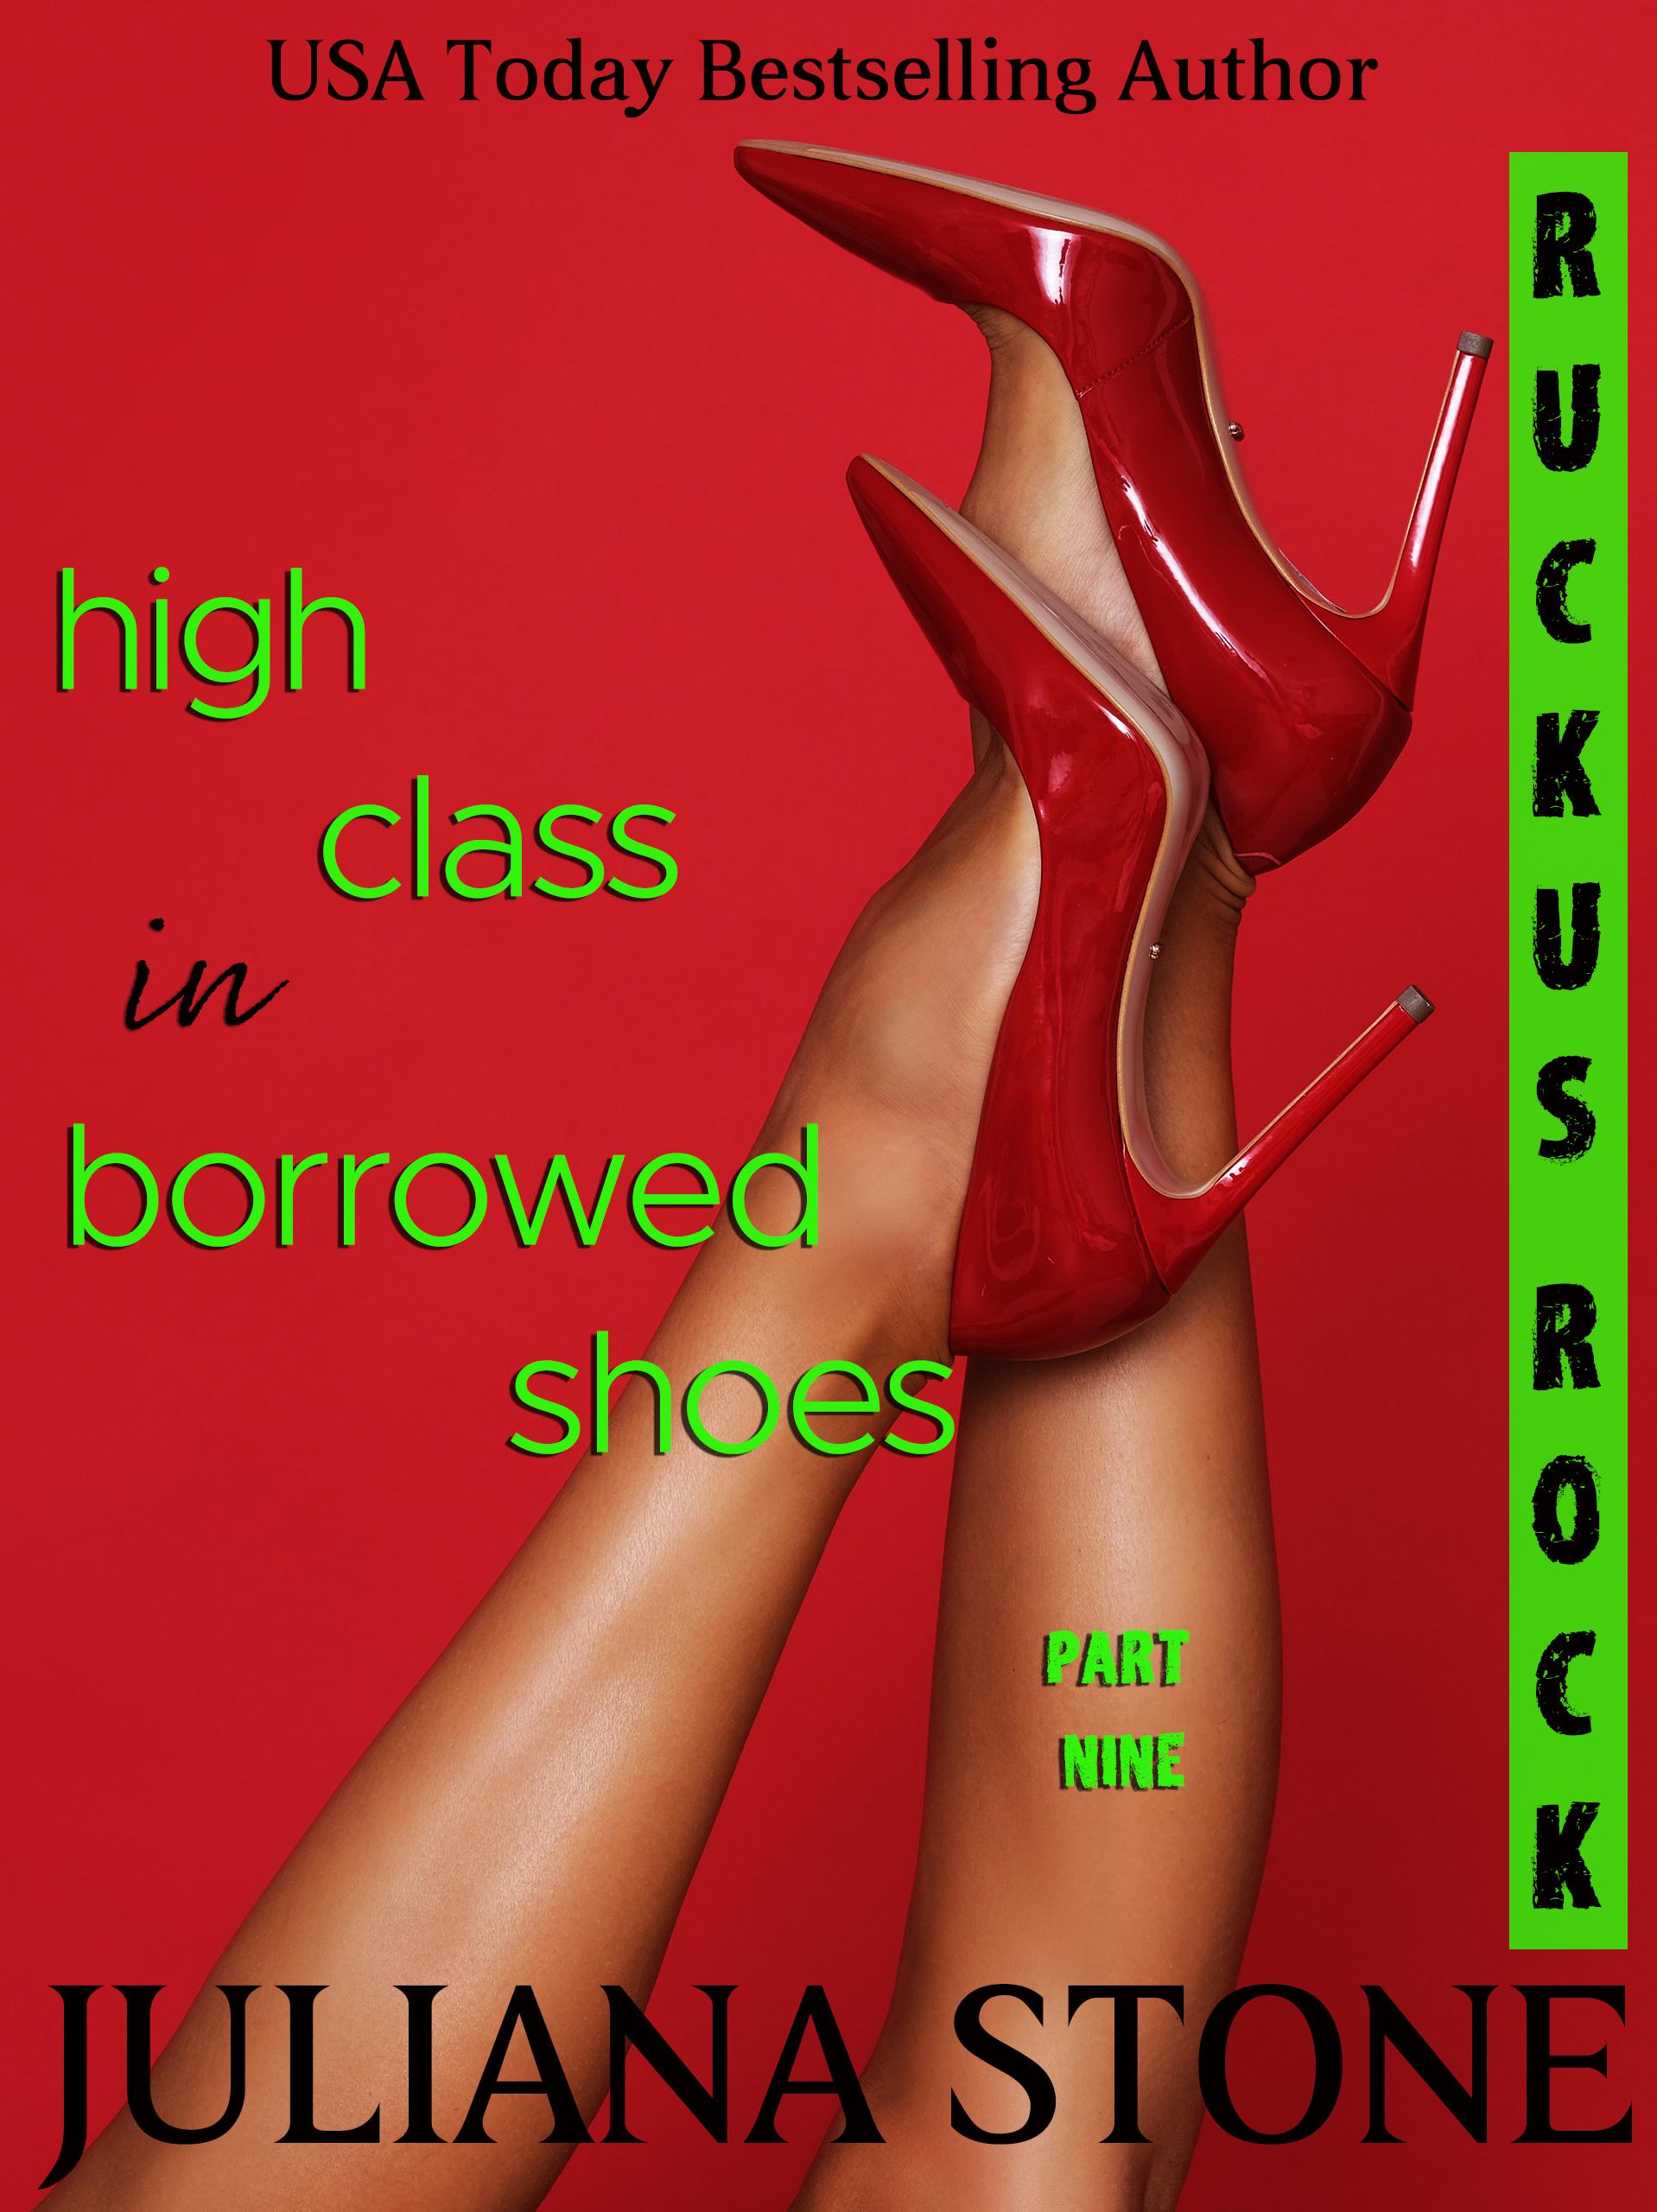 High Heels In Borrowed Shoes- Part Nine by Juliana Stone